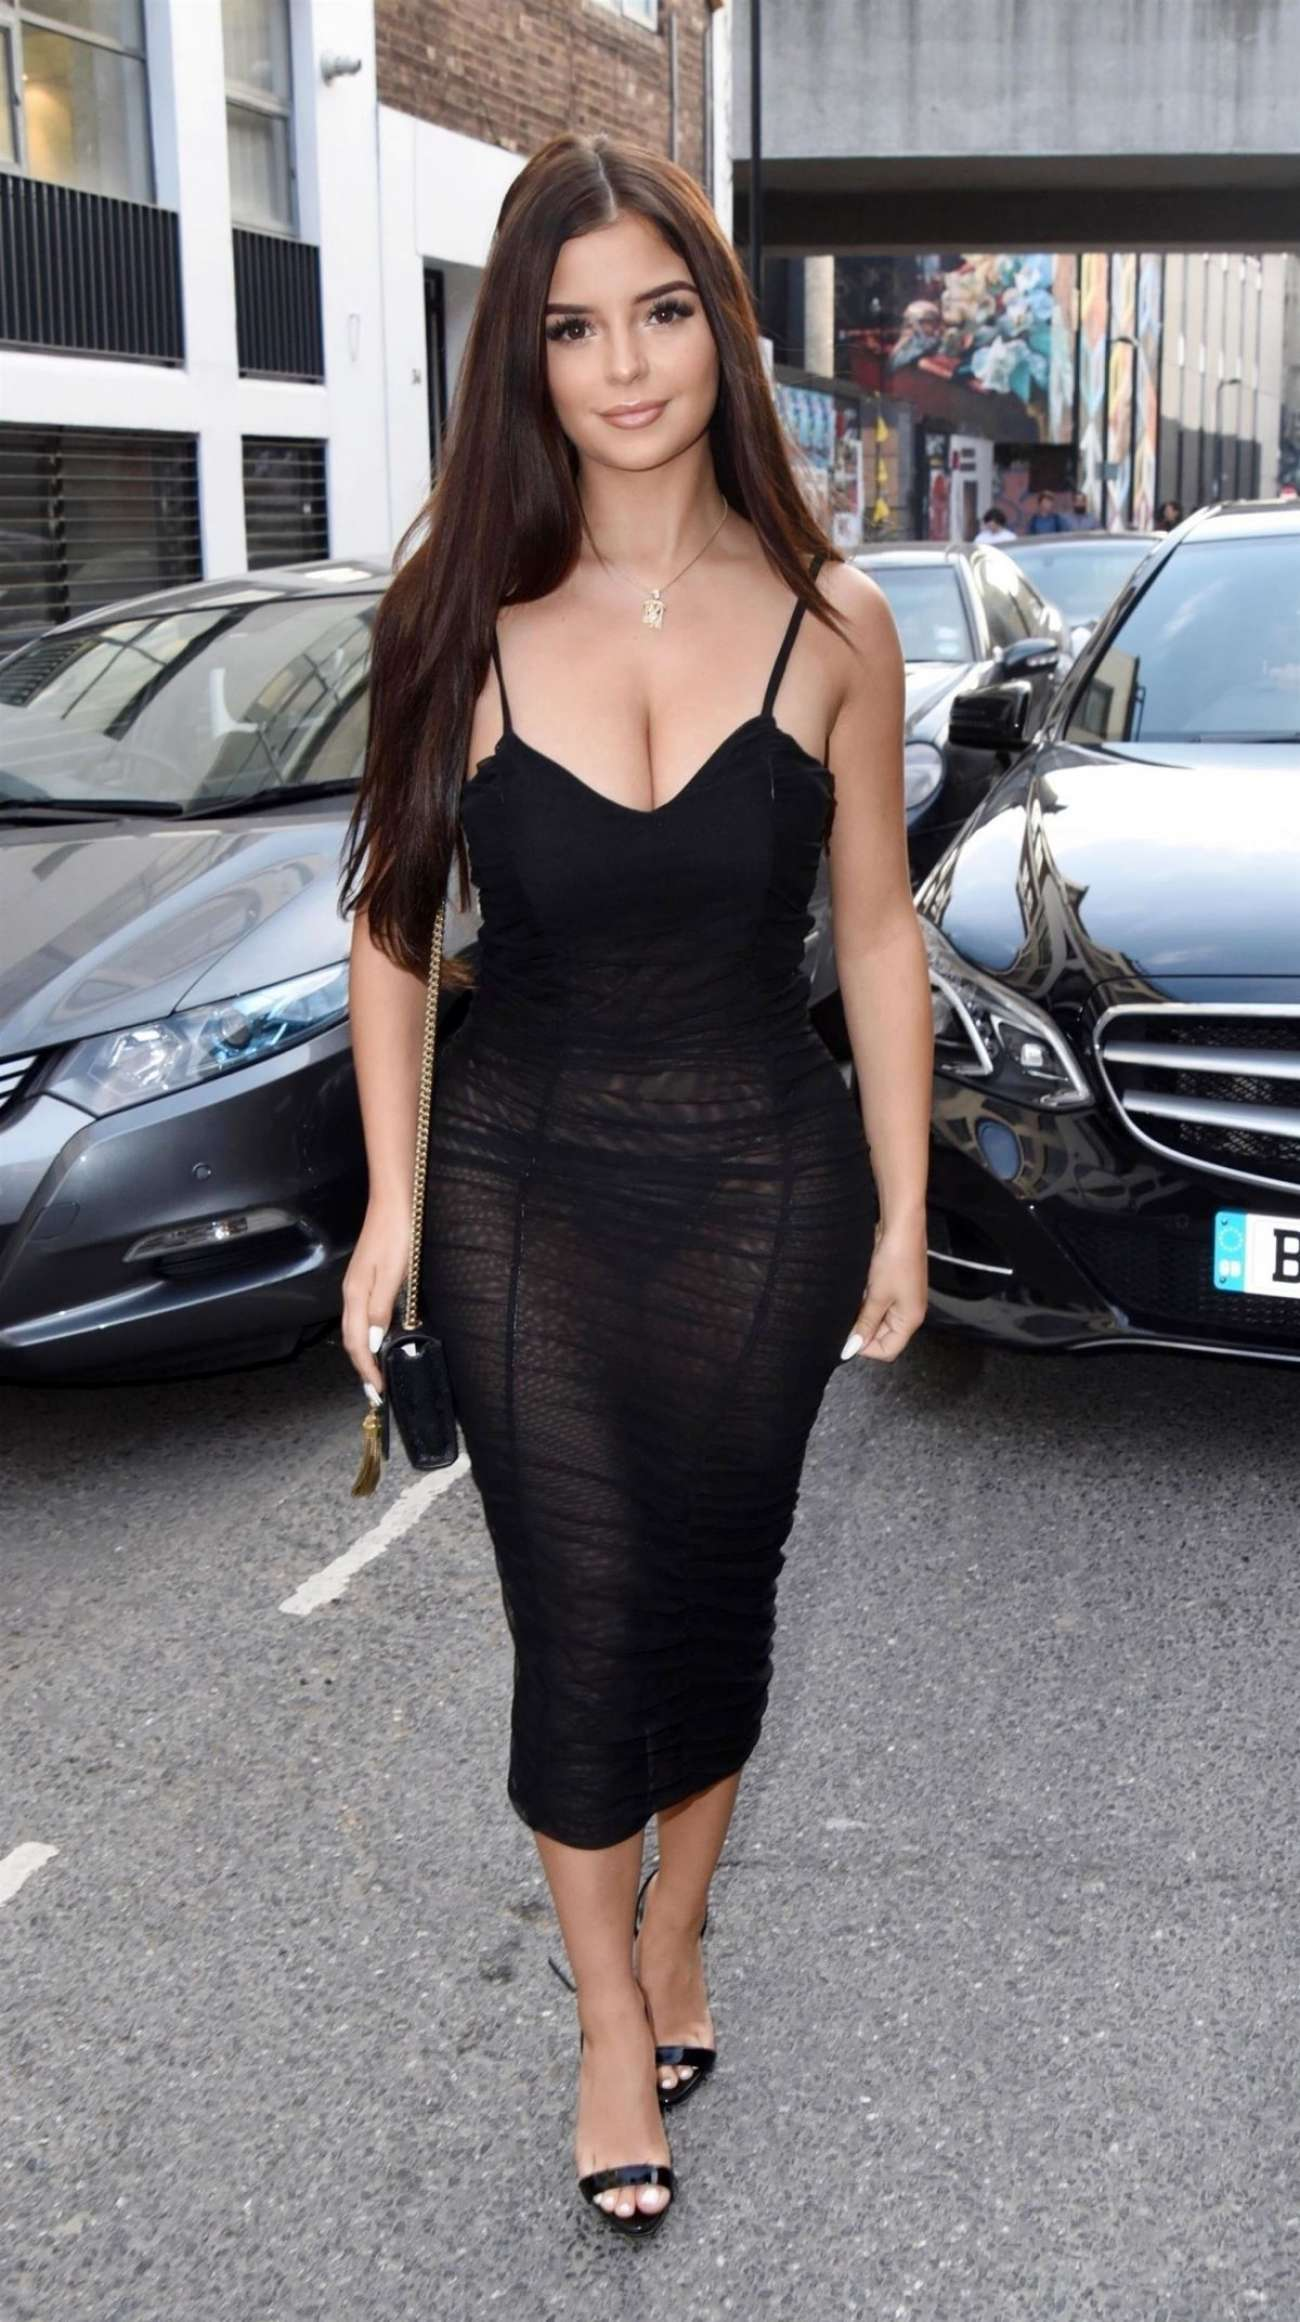 Demi Rose Mawby 2018 : Demi Rose Mawby: Skinny Dip Event In London-08